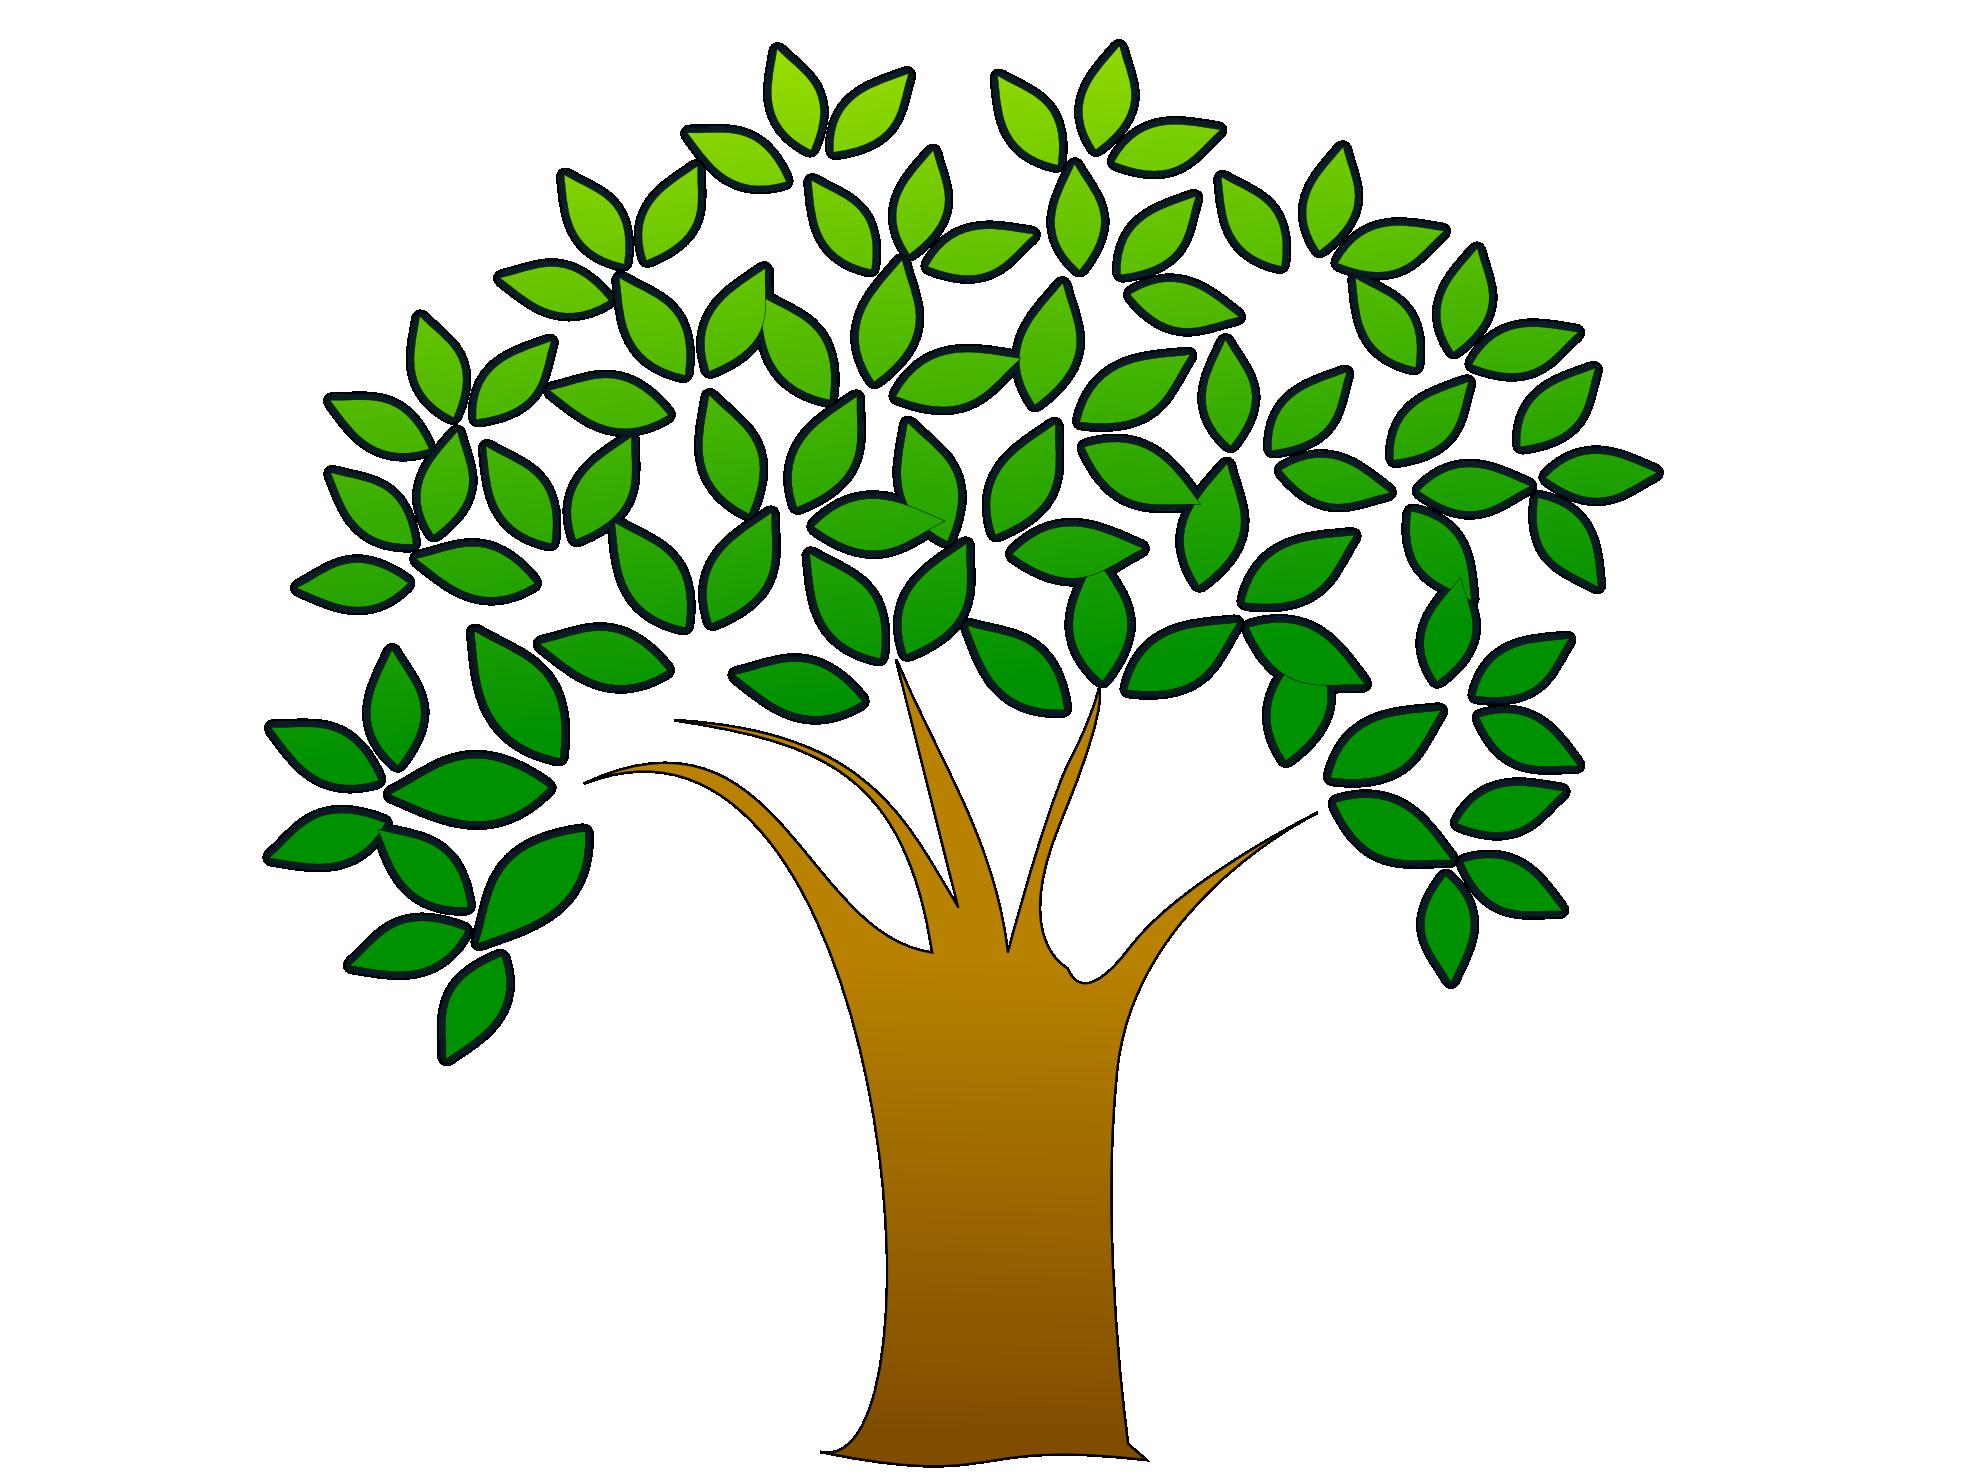 Tree clipart free clipart images - Tree Clipart PNG